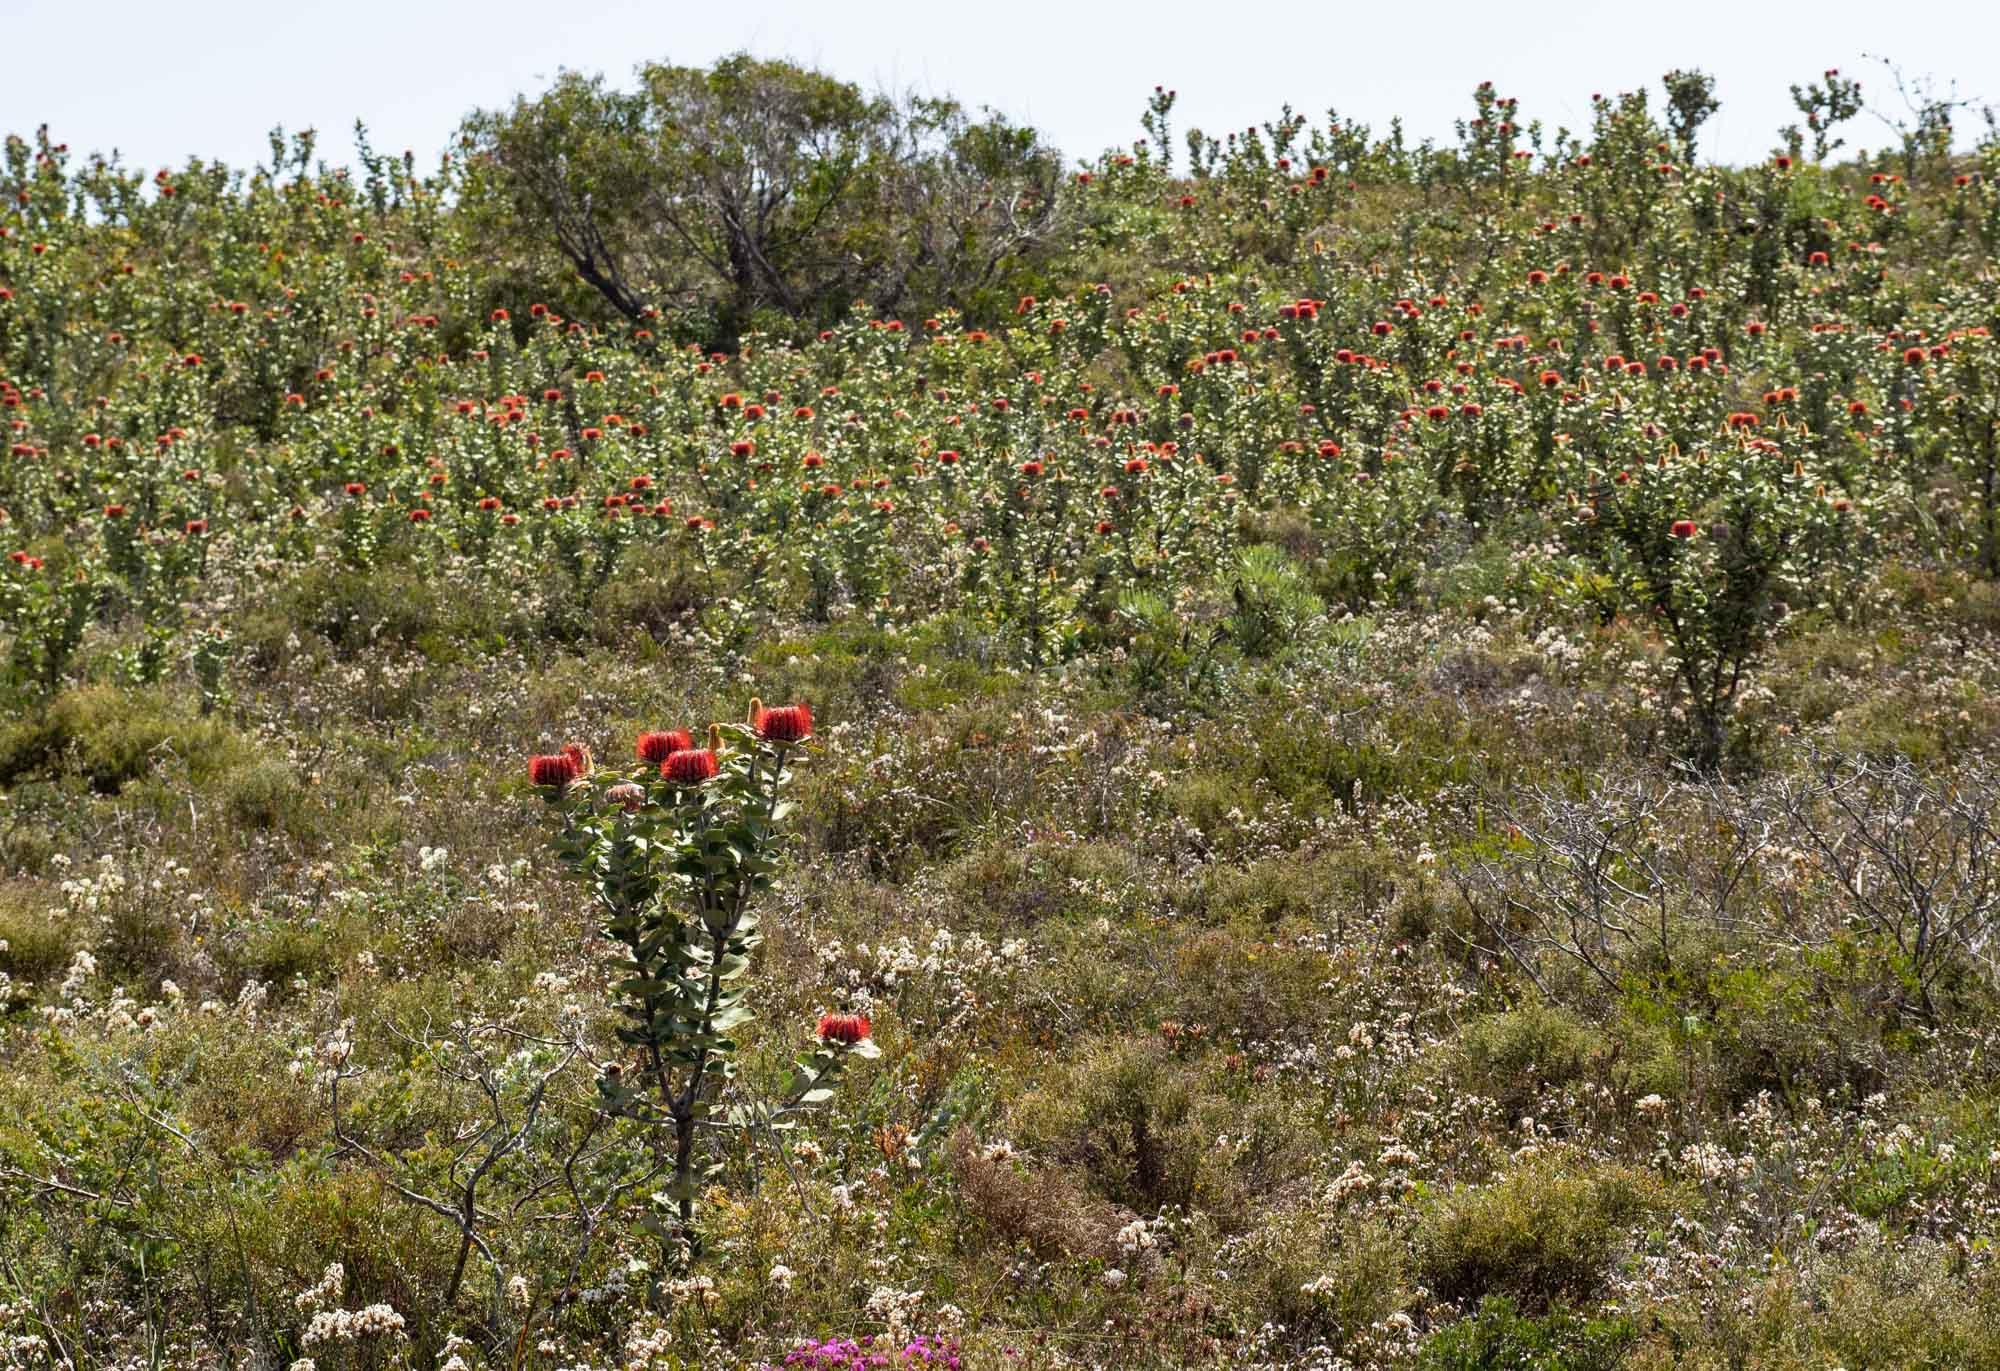 Scarlet Banksias everywhere!